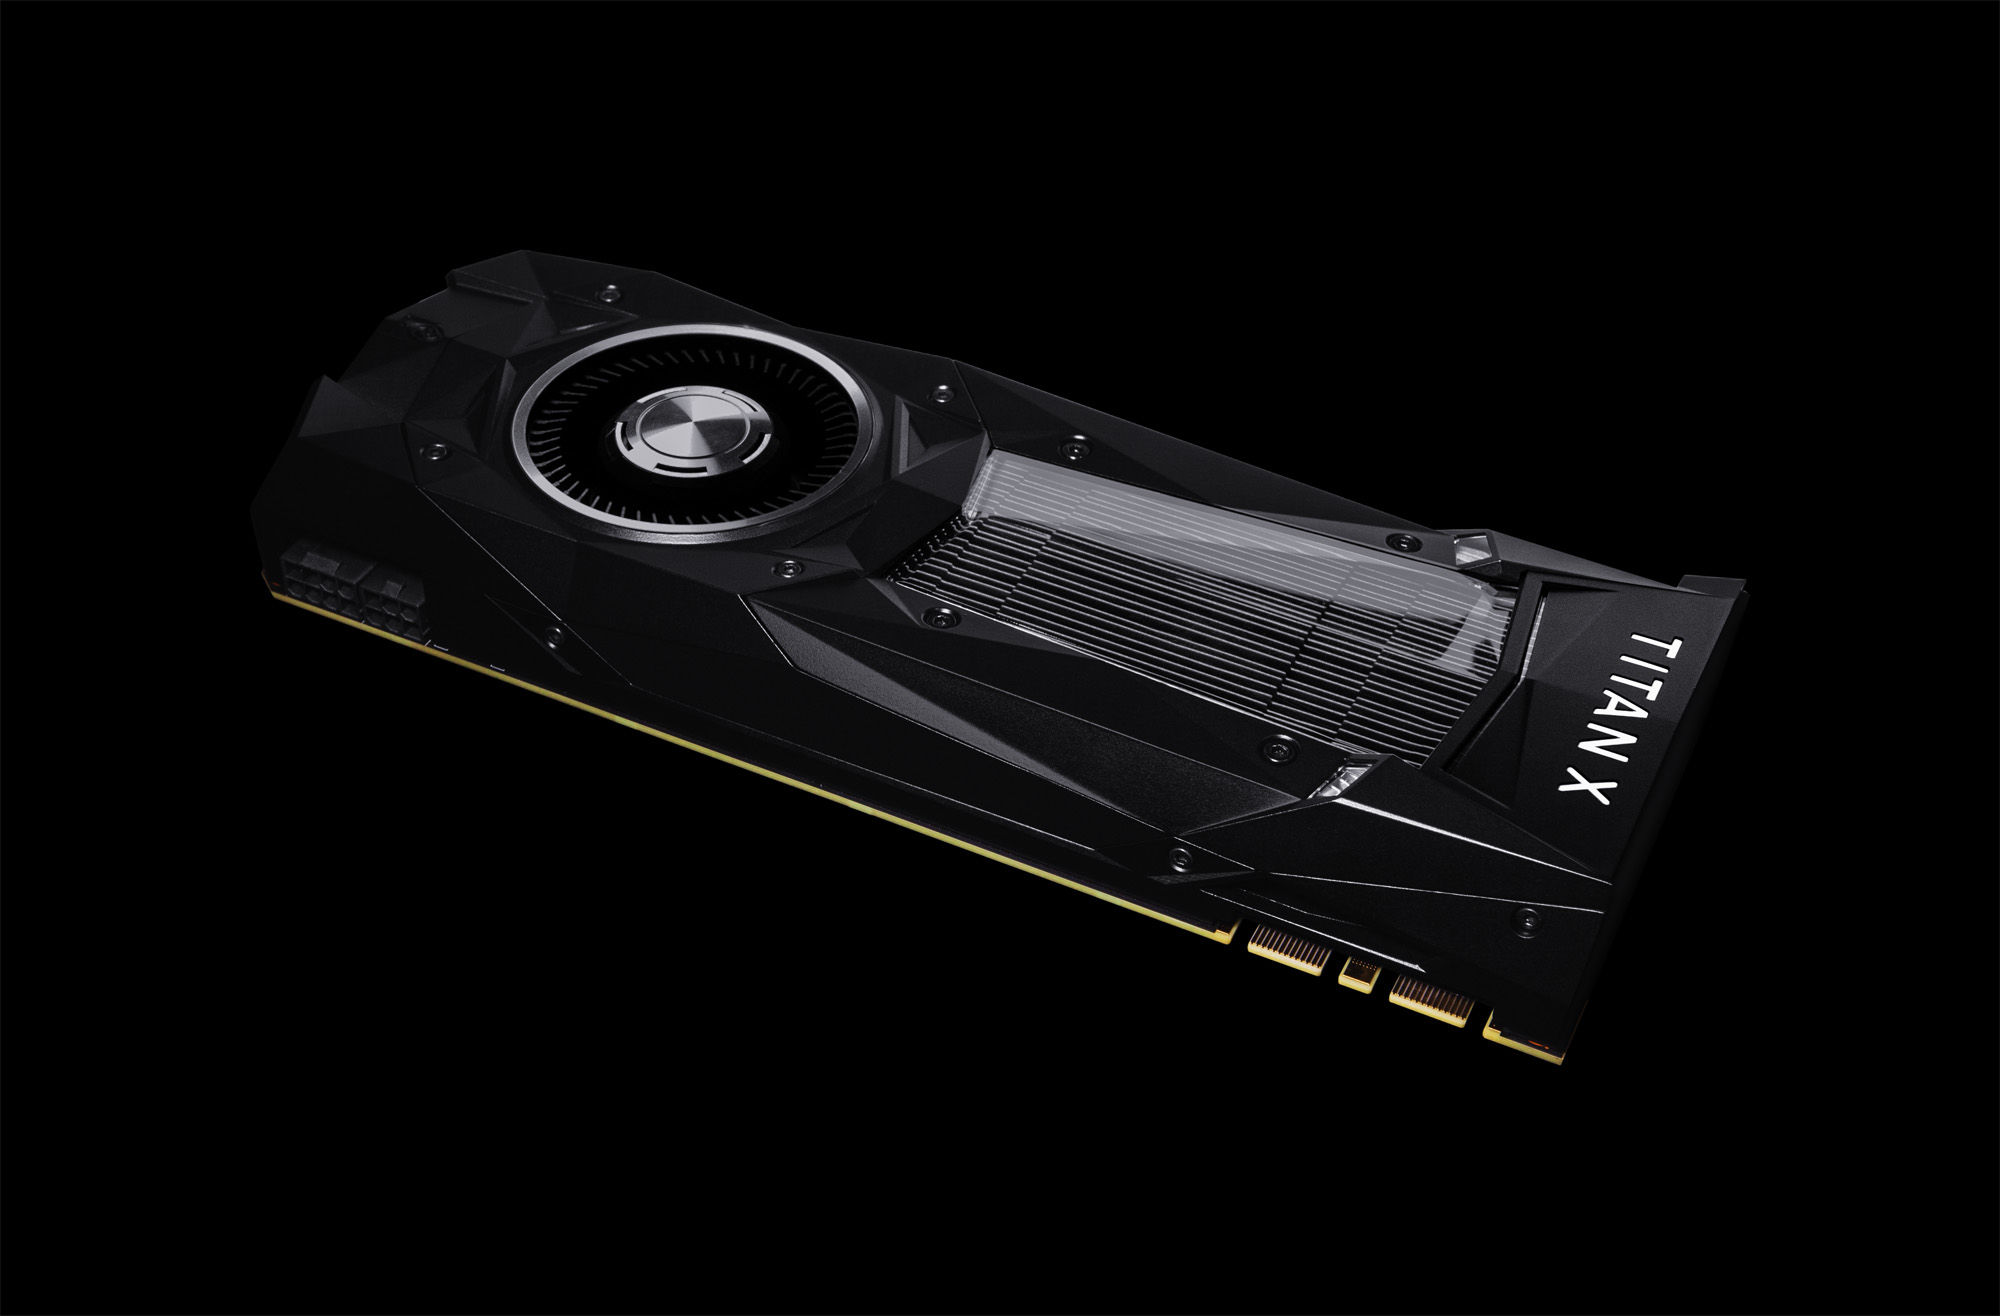 NVIDIA lance une énorme TITAN Xp